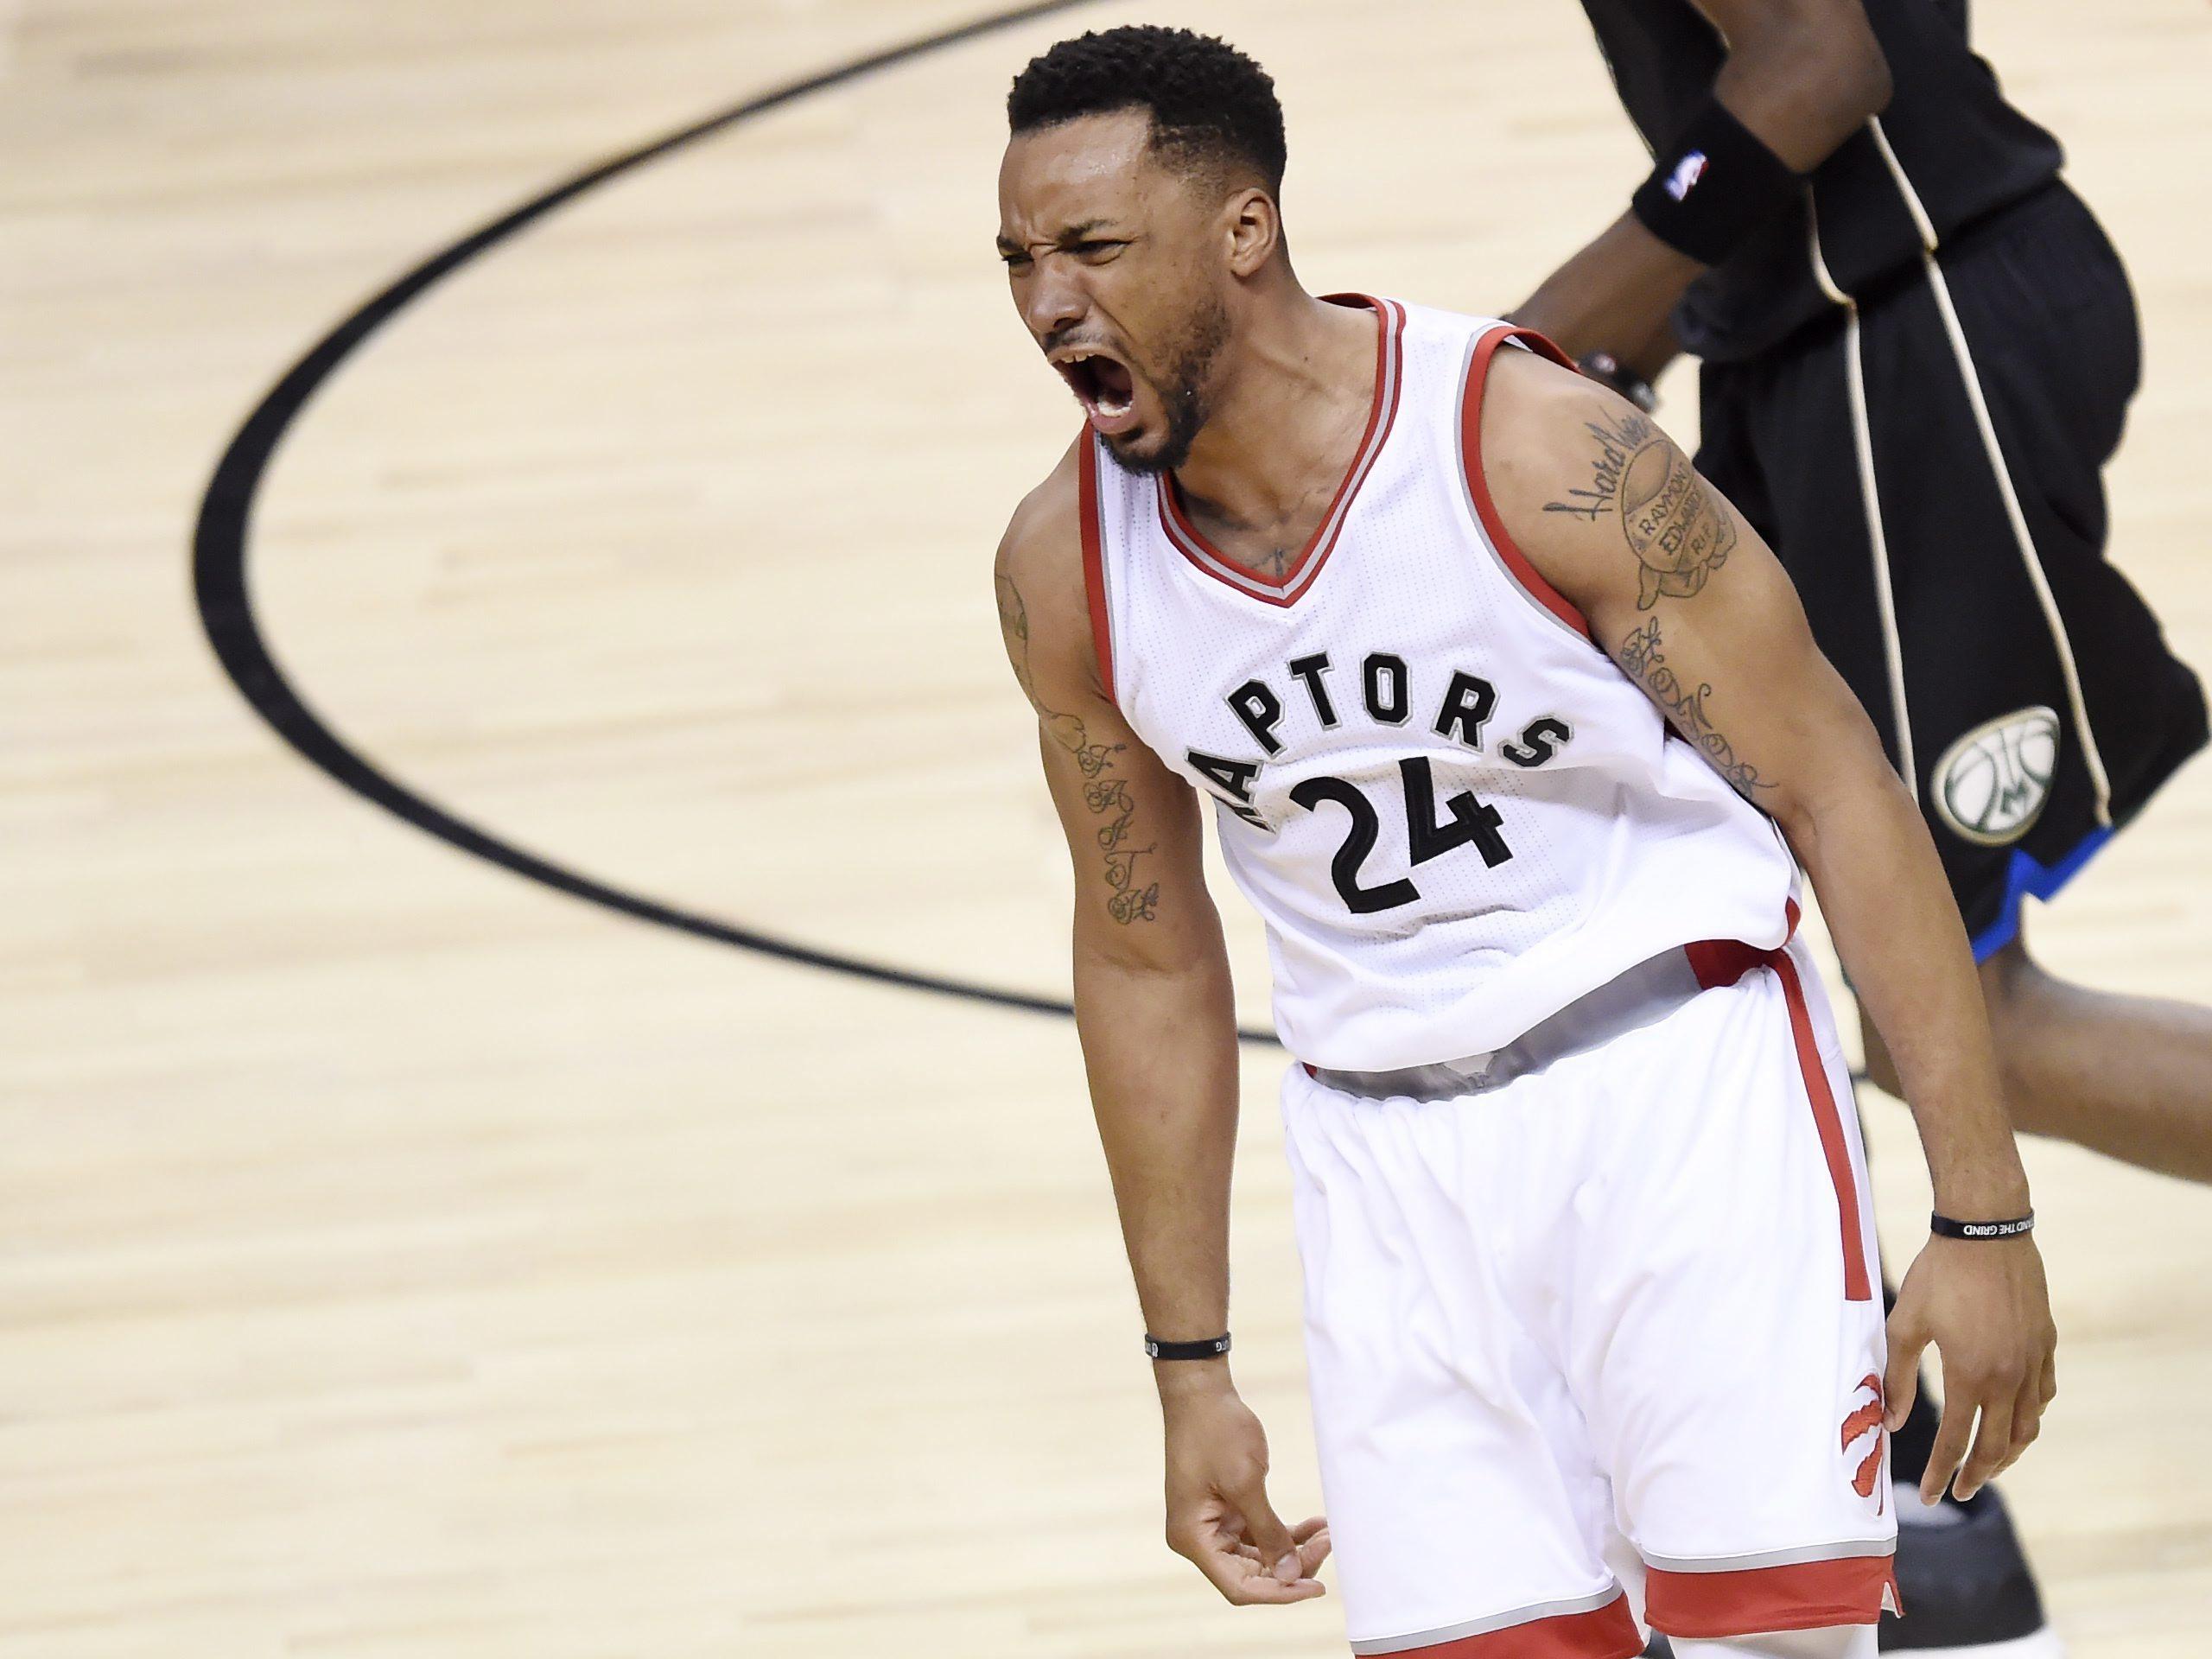 Basket - NBA - NBA : les deux énormes dunks de Norm Powell en vidéo